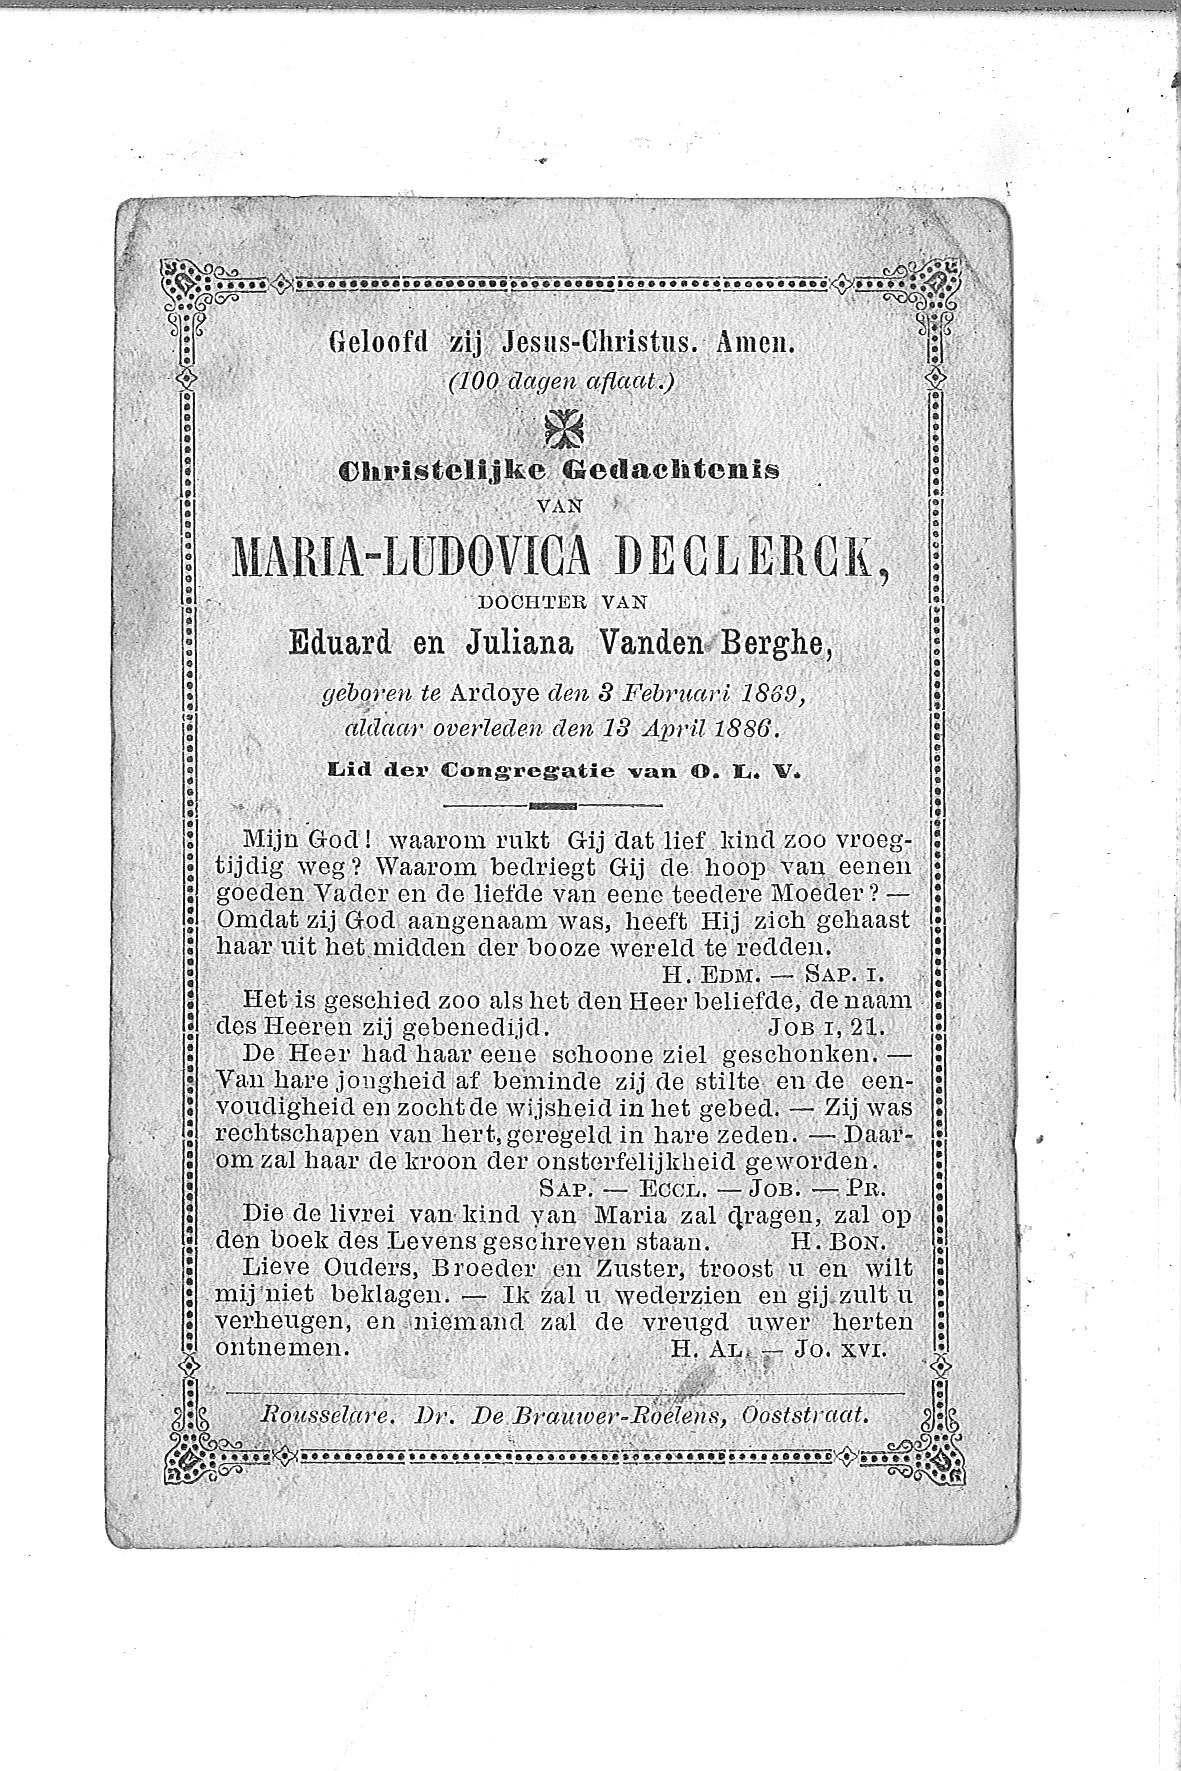 maria-ludovica(1886).jpg